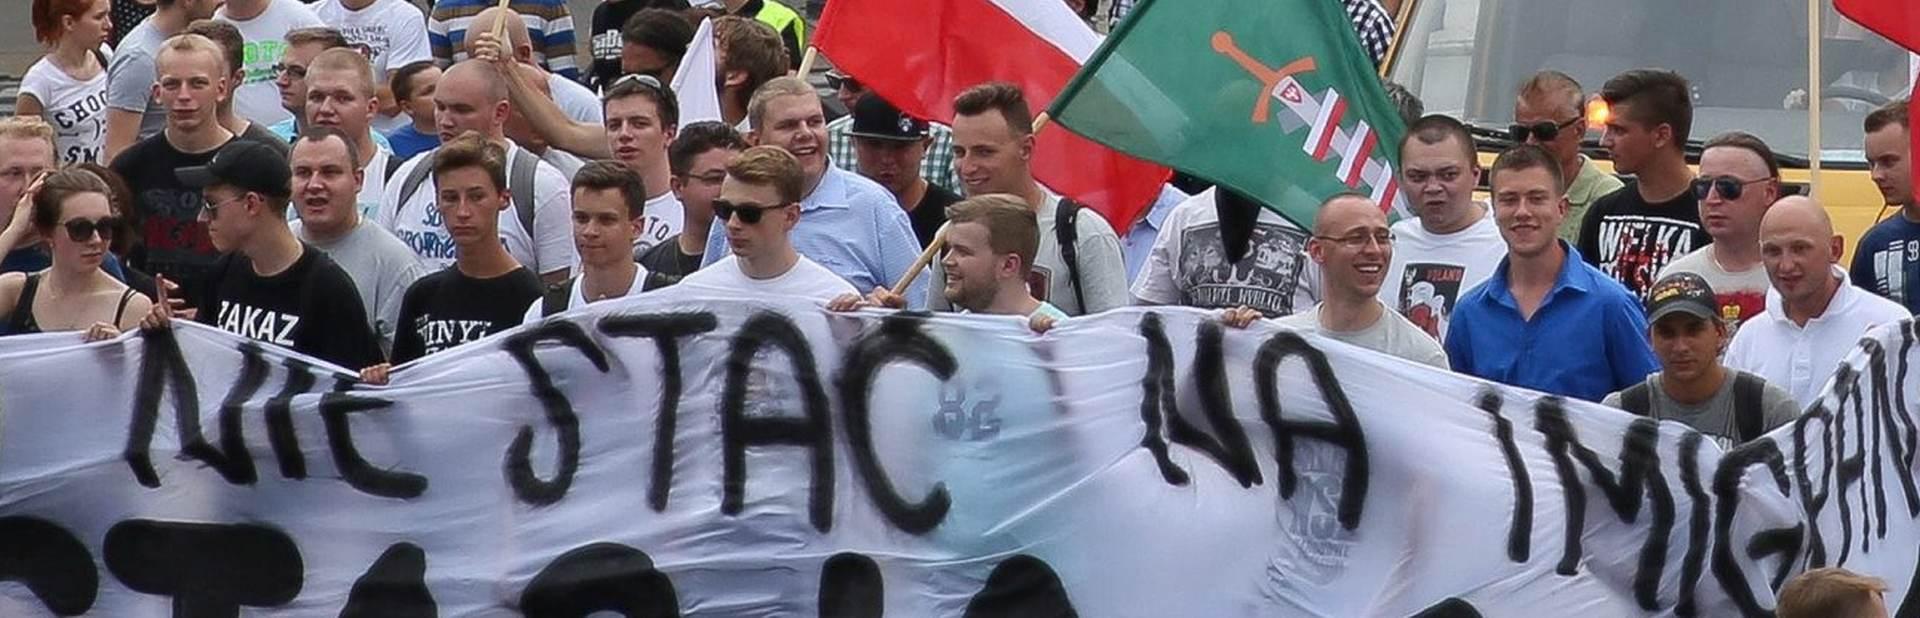 FINSKA: Sukobi na mimohodu neonacista, 30 uhićenih